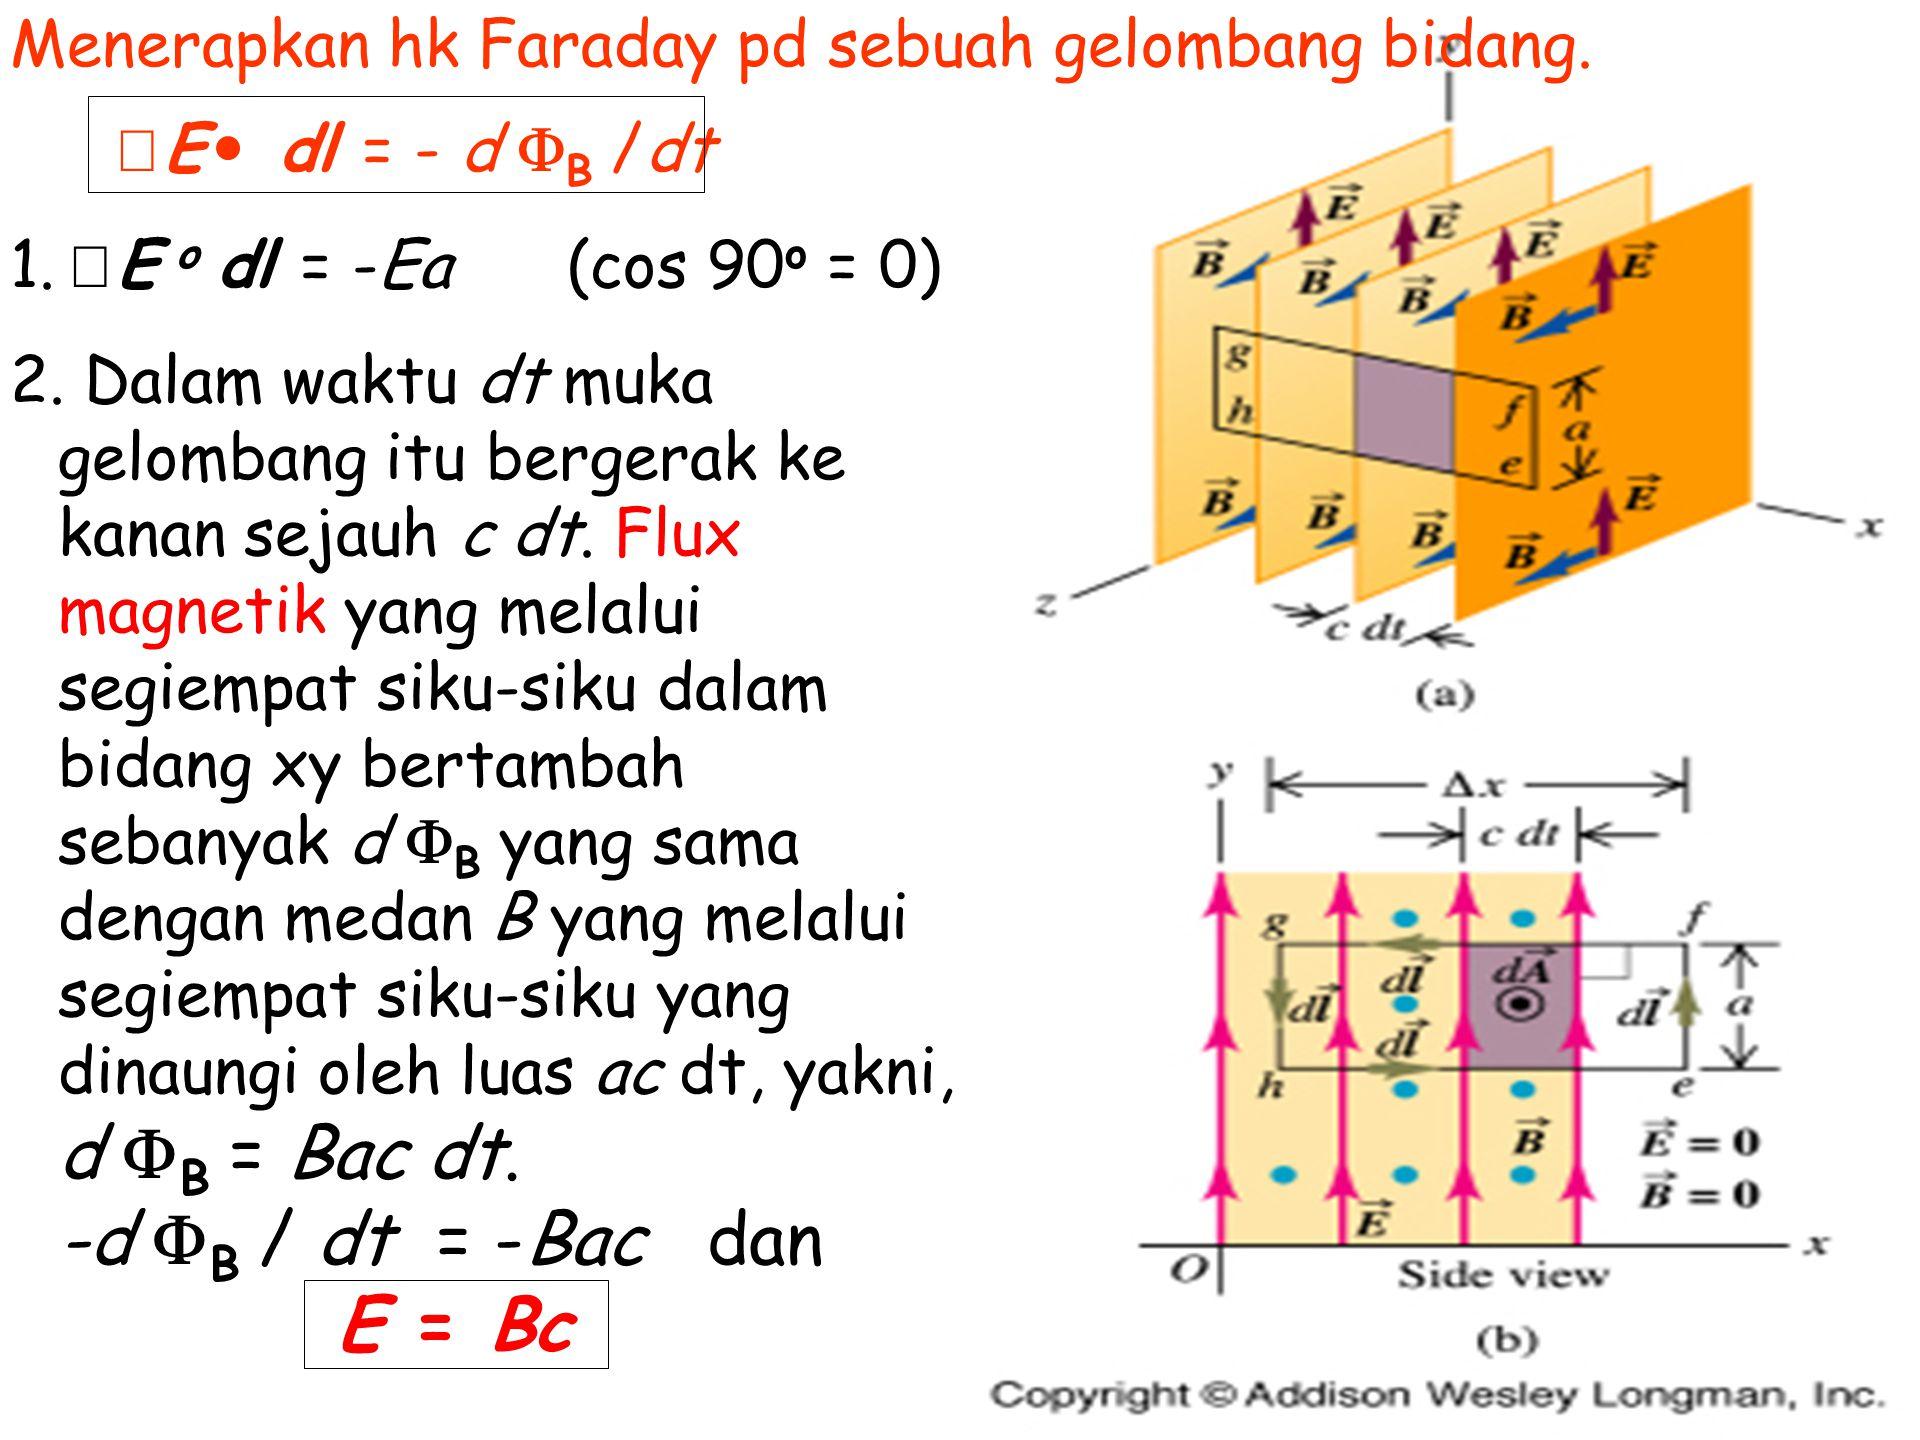 Menerapkan hk Faraday pd sebuah gelombang bidang. E dl = - d  B /dt 1.